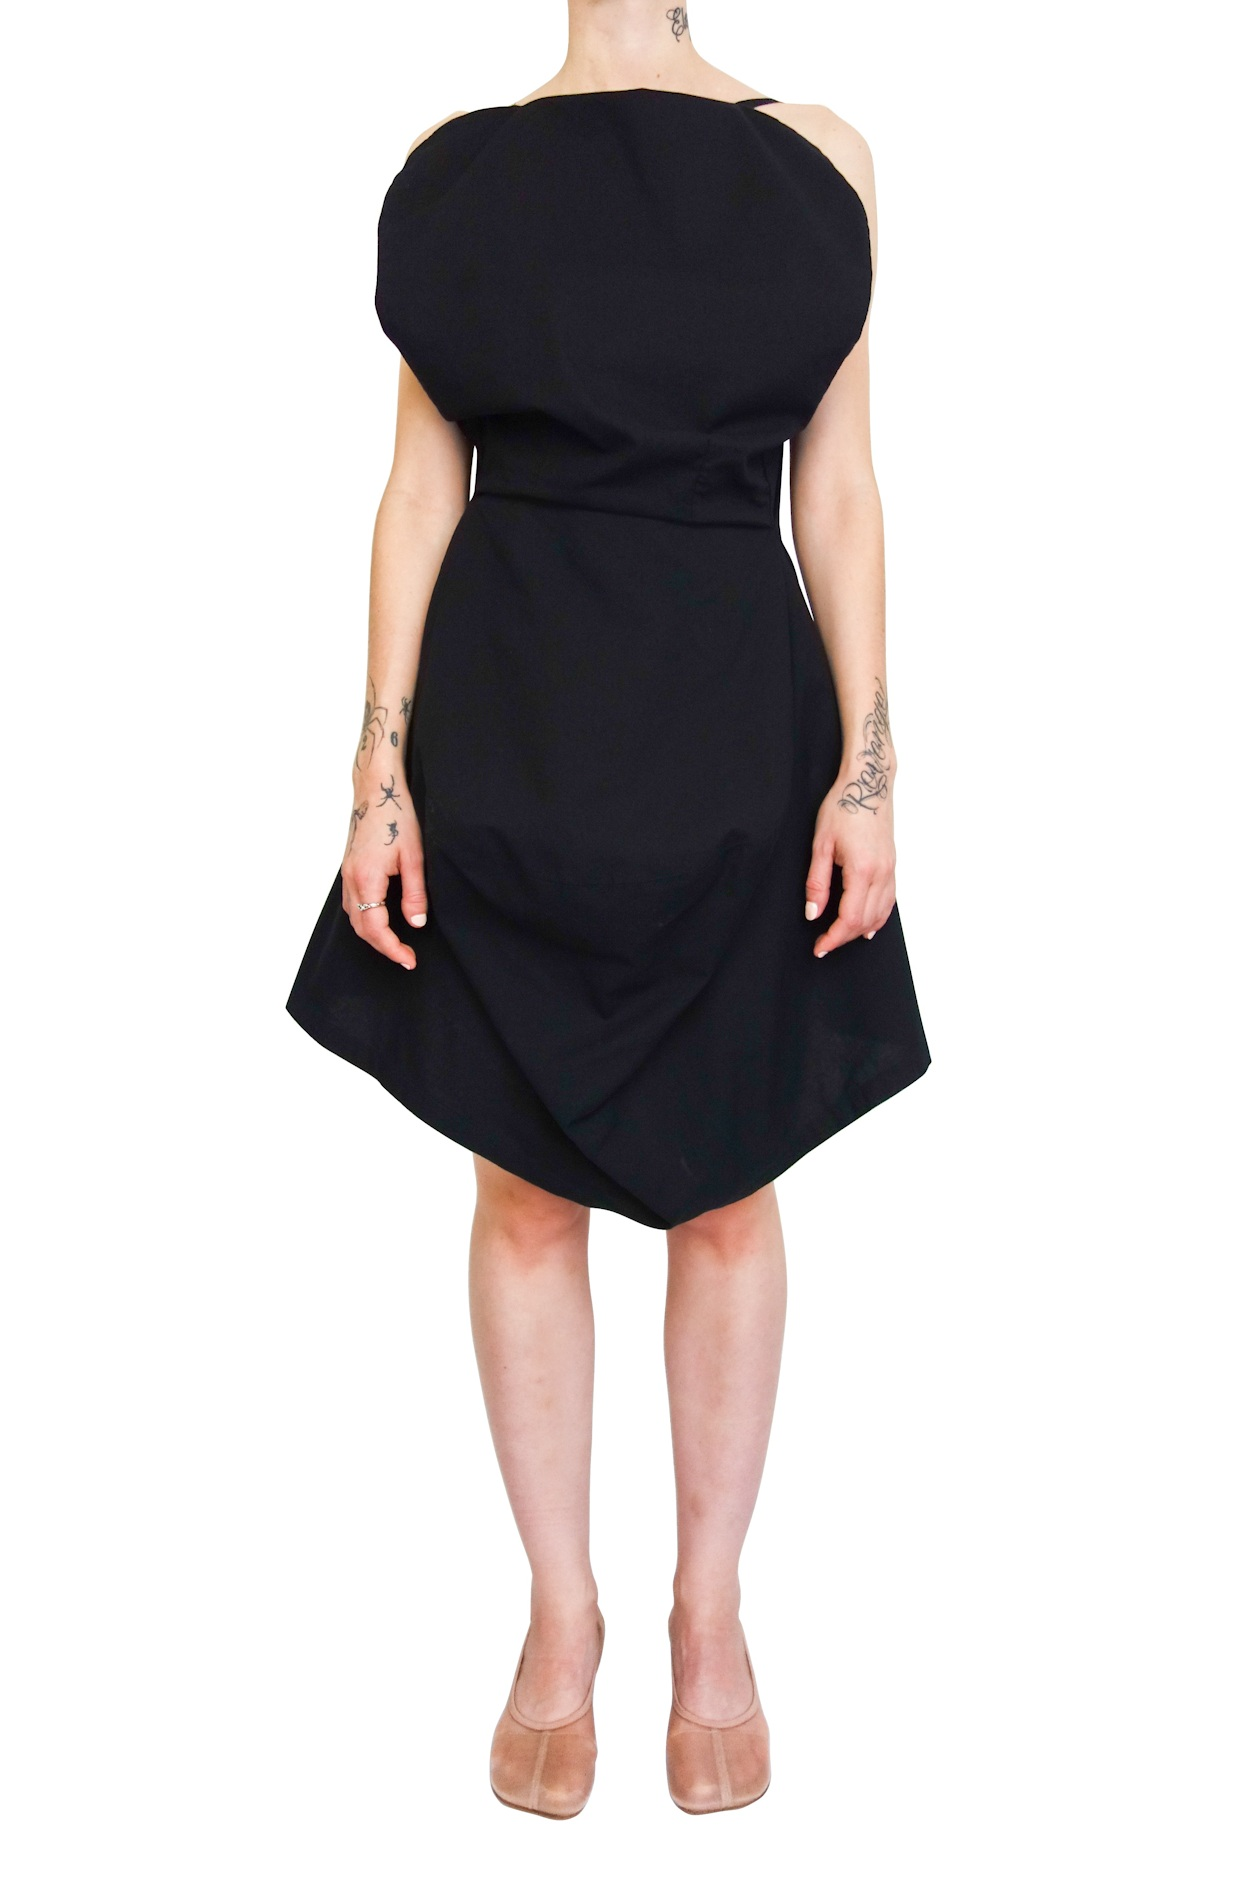 MM6 MAISON MARGIELA Seat Cover Dress (729) now $349